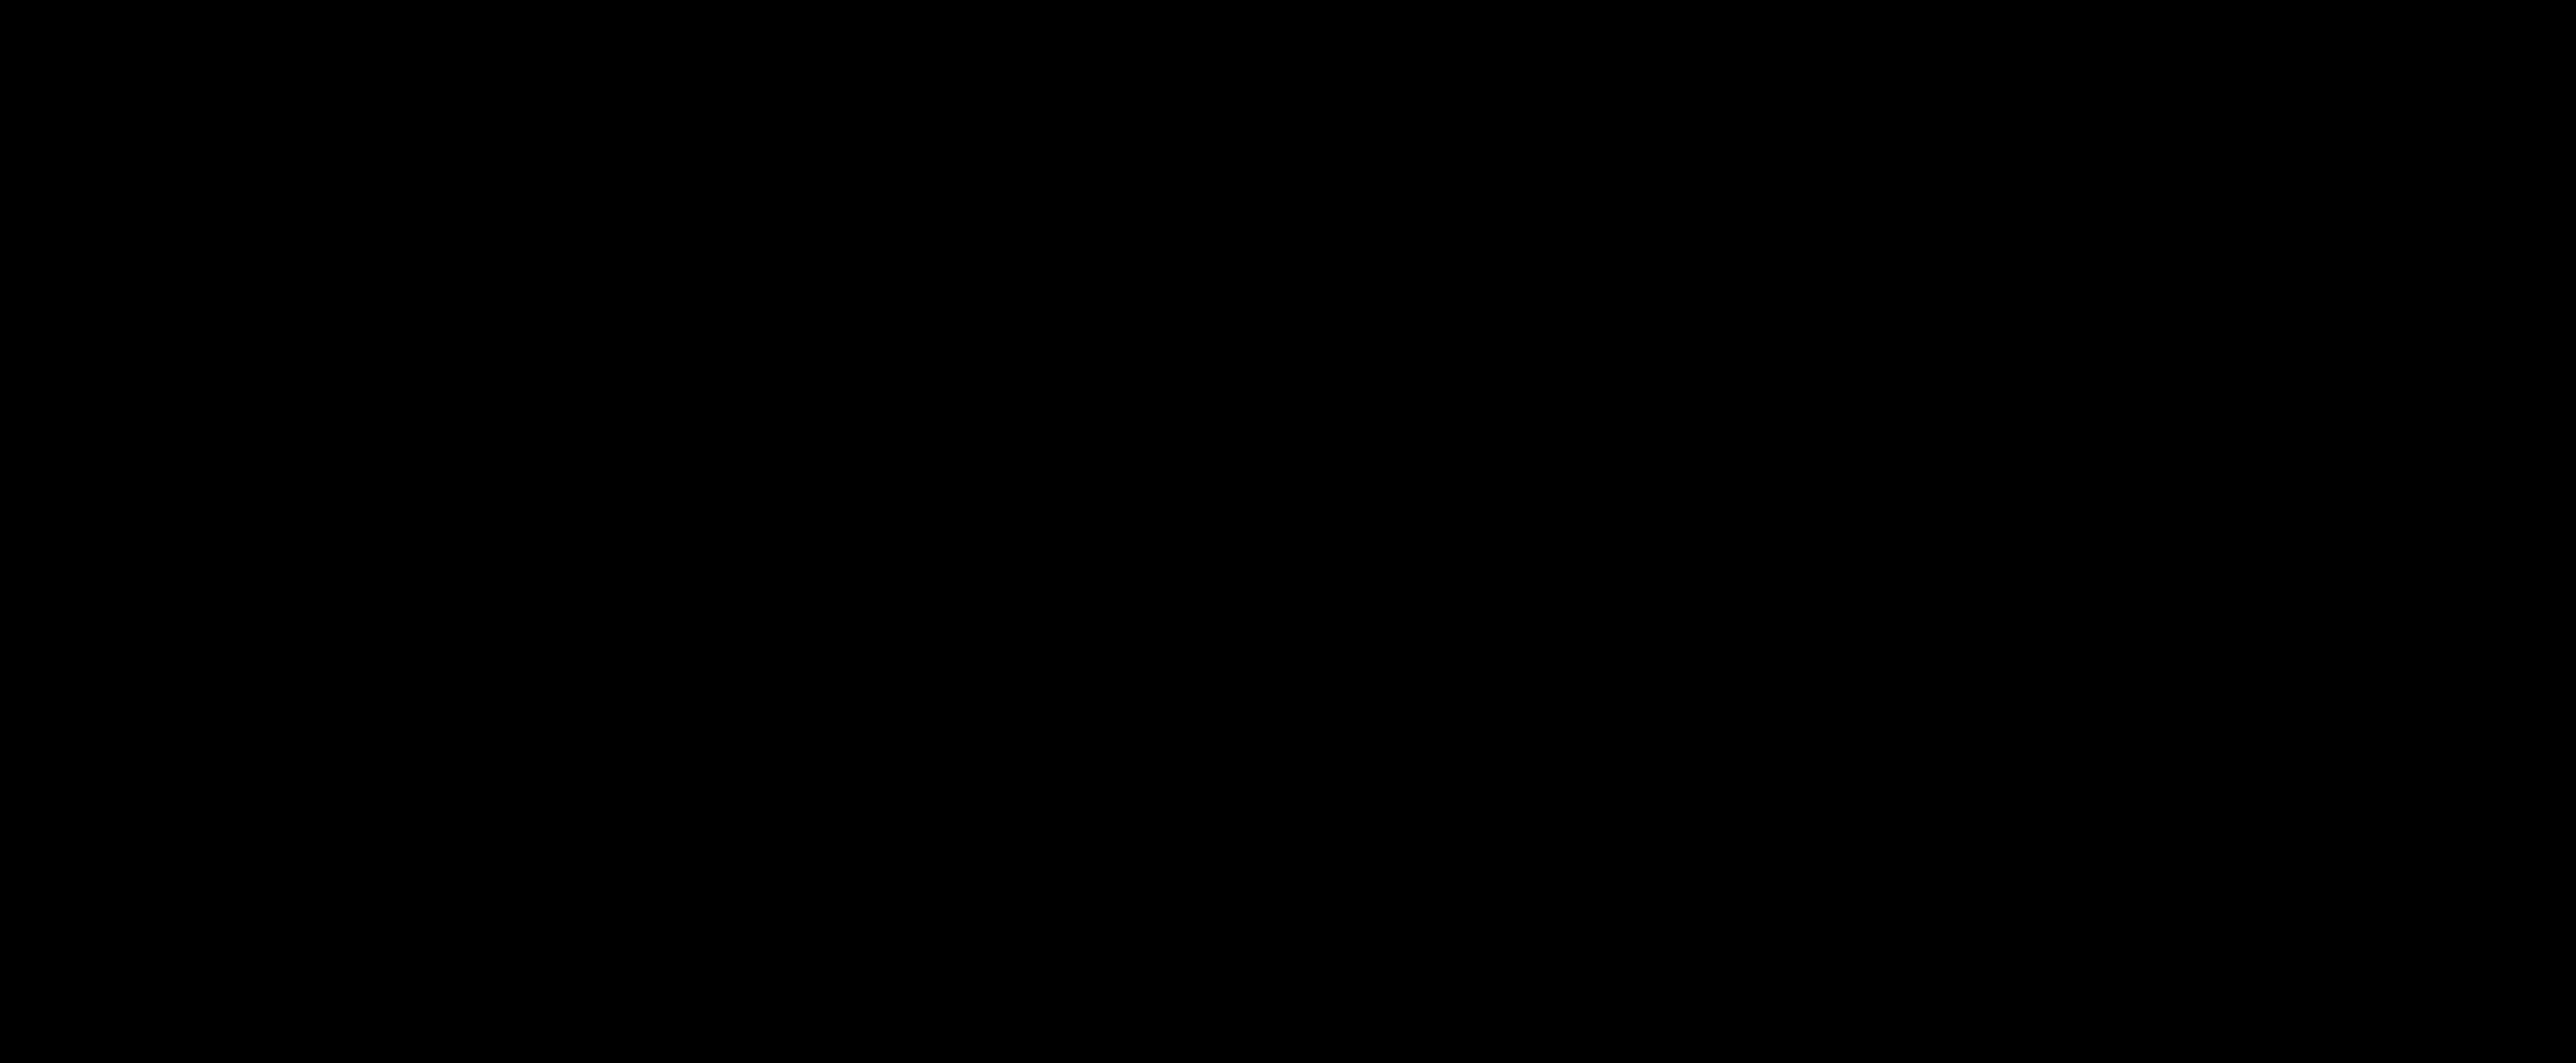 Logo for Pfizer